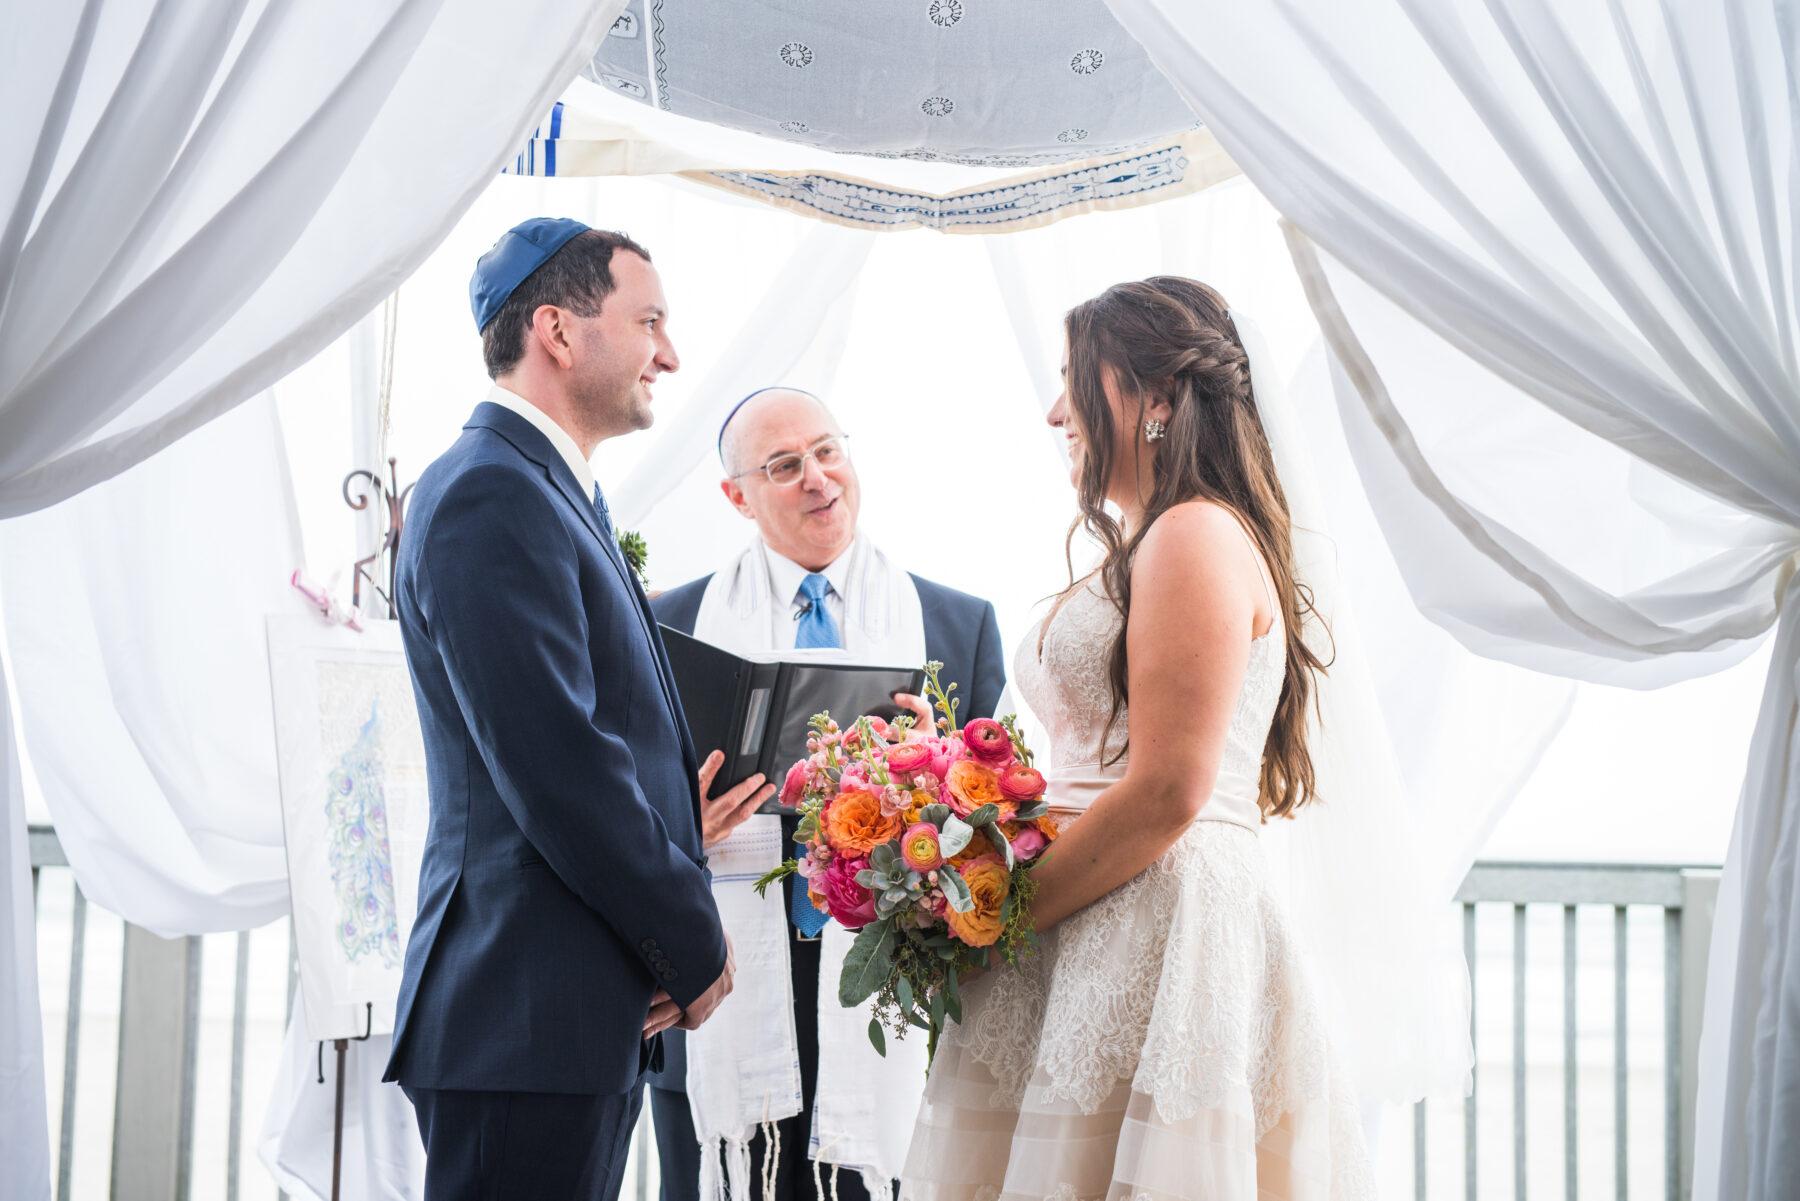 North Beach Club House Wedding Shannon and Brian Blueflash Photography 16